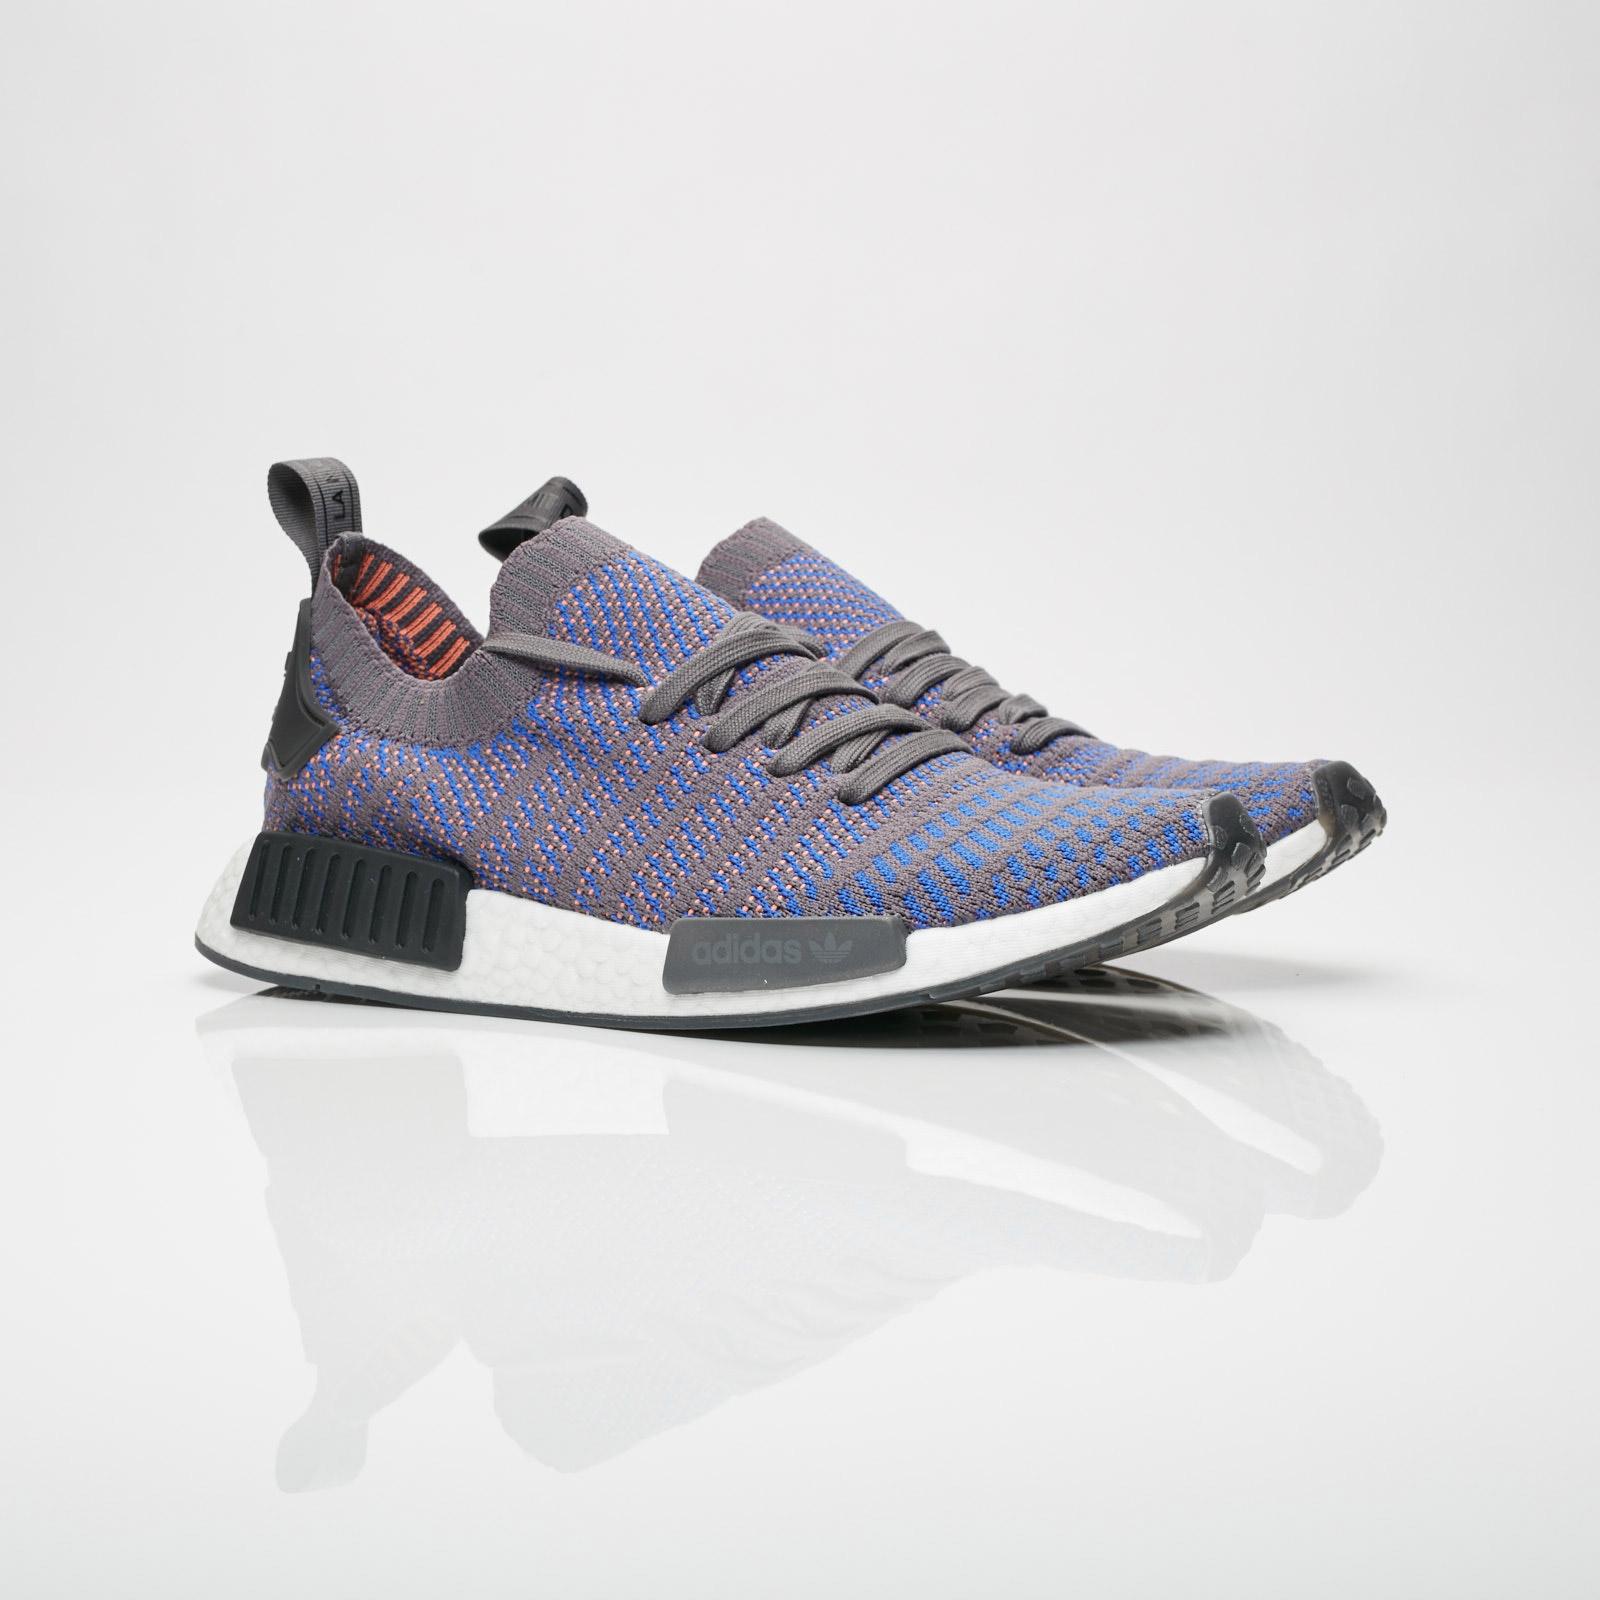 95a34e49de6 adidas NMD R1 Stlt PK - Cq2388 - Sneakersnstuff